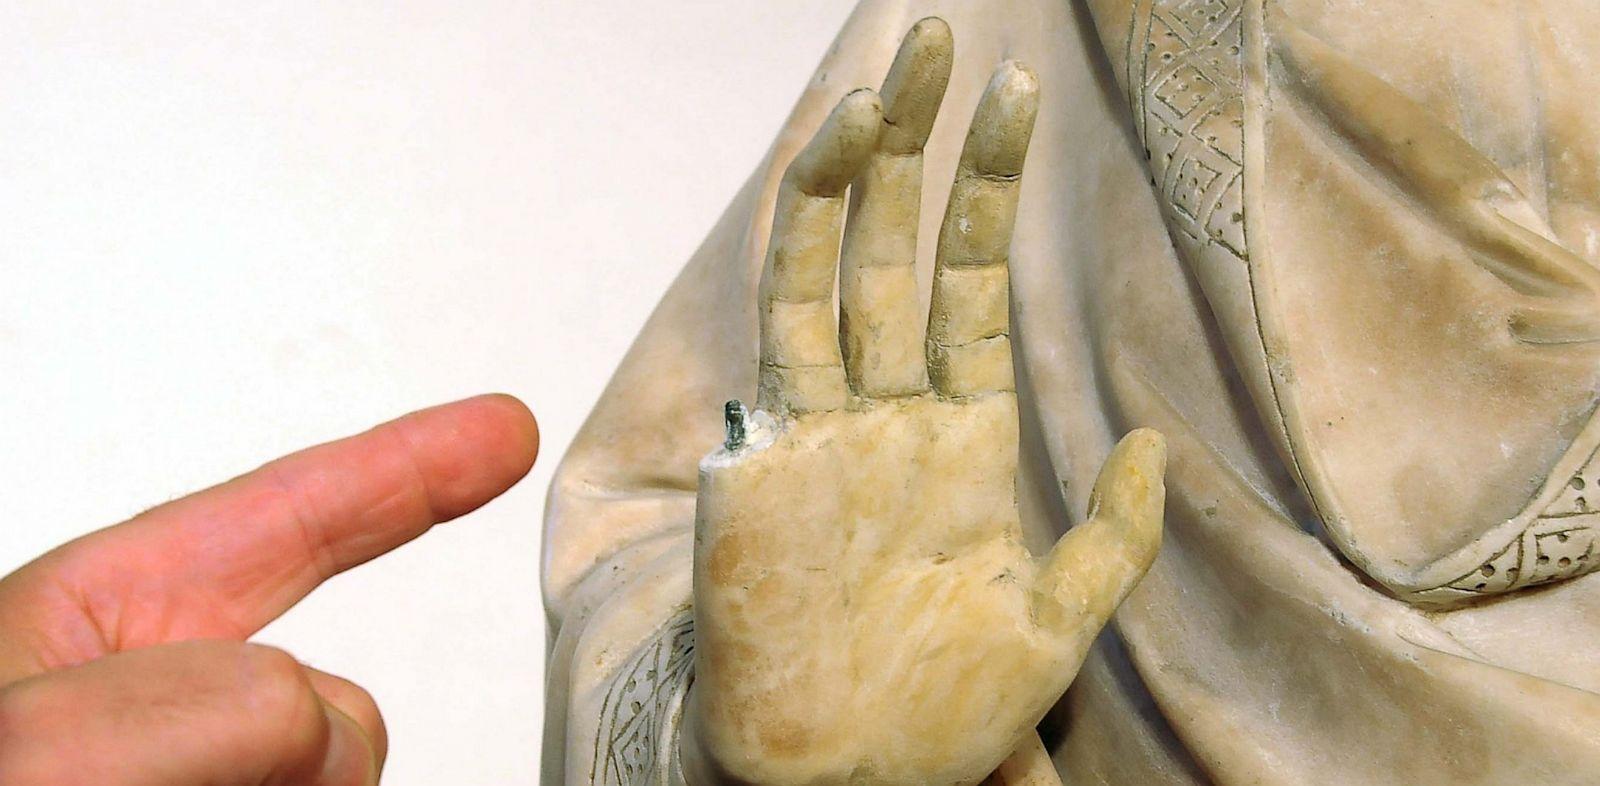 PHOTO: Florences Museo dellOpera del Duomo, broke a finger off a 14th century statue on display.